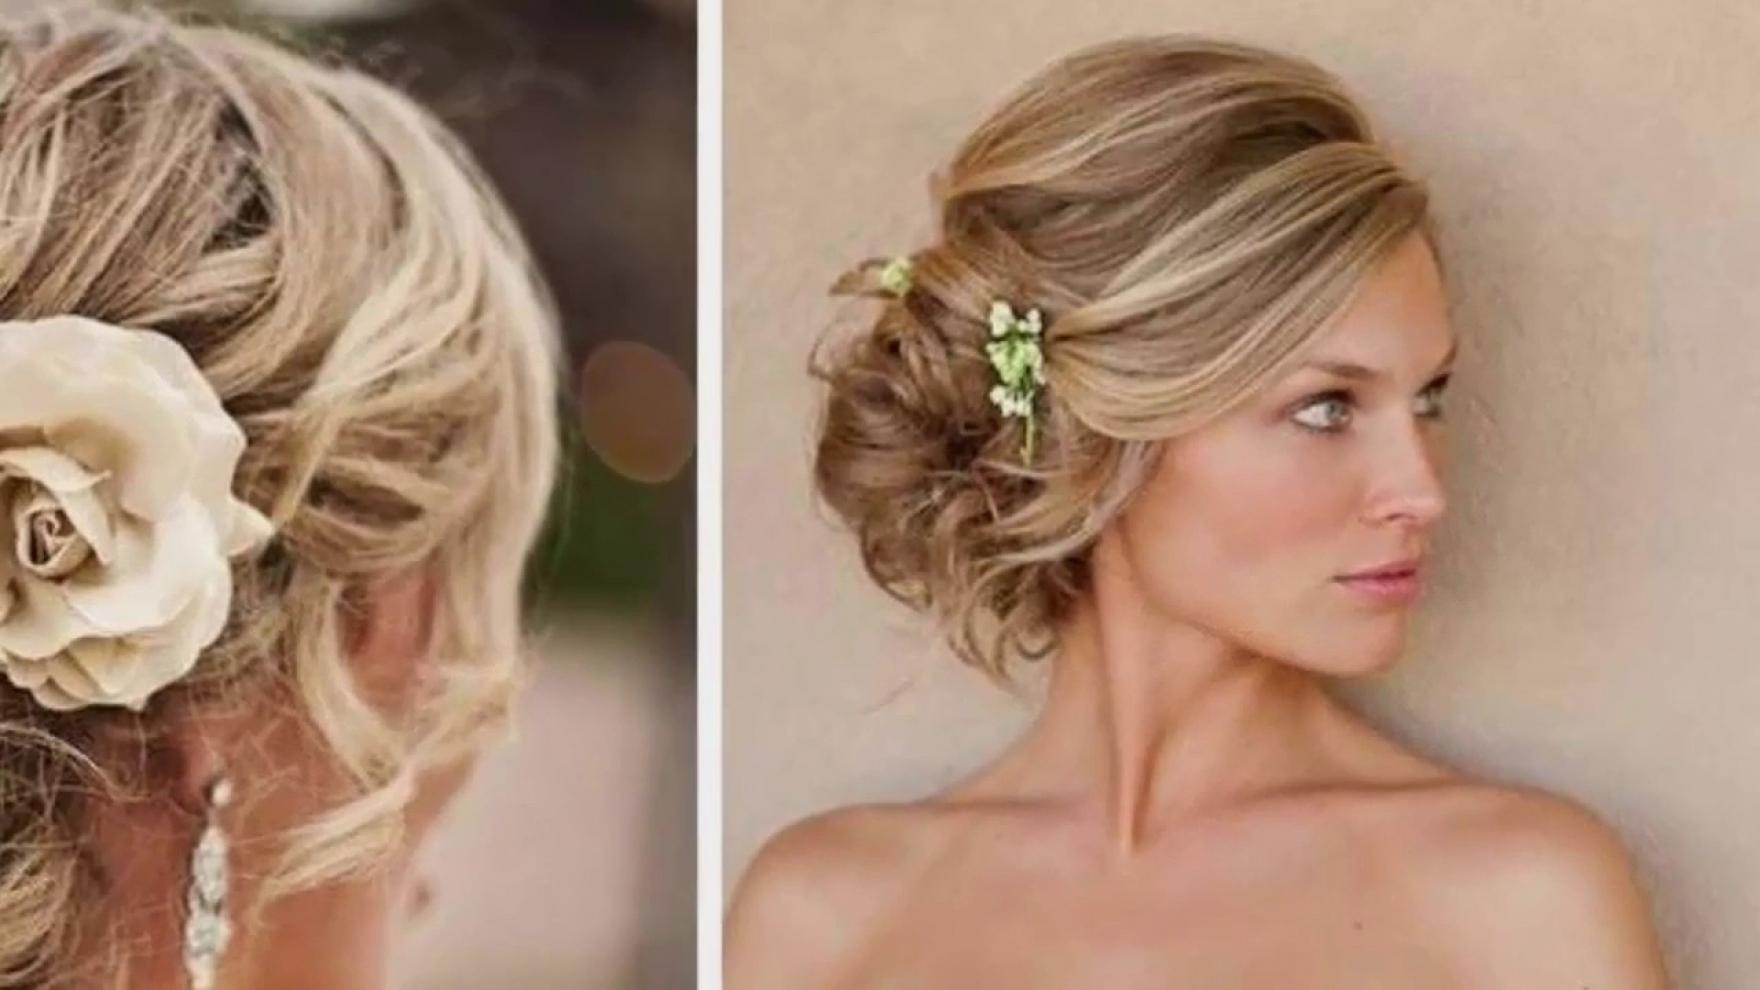 incroyable-tendance-coiffure-mariage-2018-des-coiffures-pour-titl-5a91eb2a95ab2.jpg